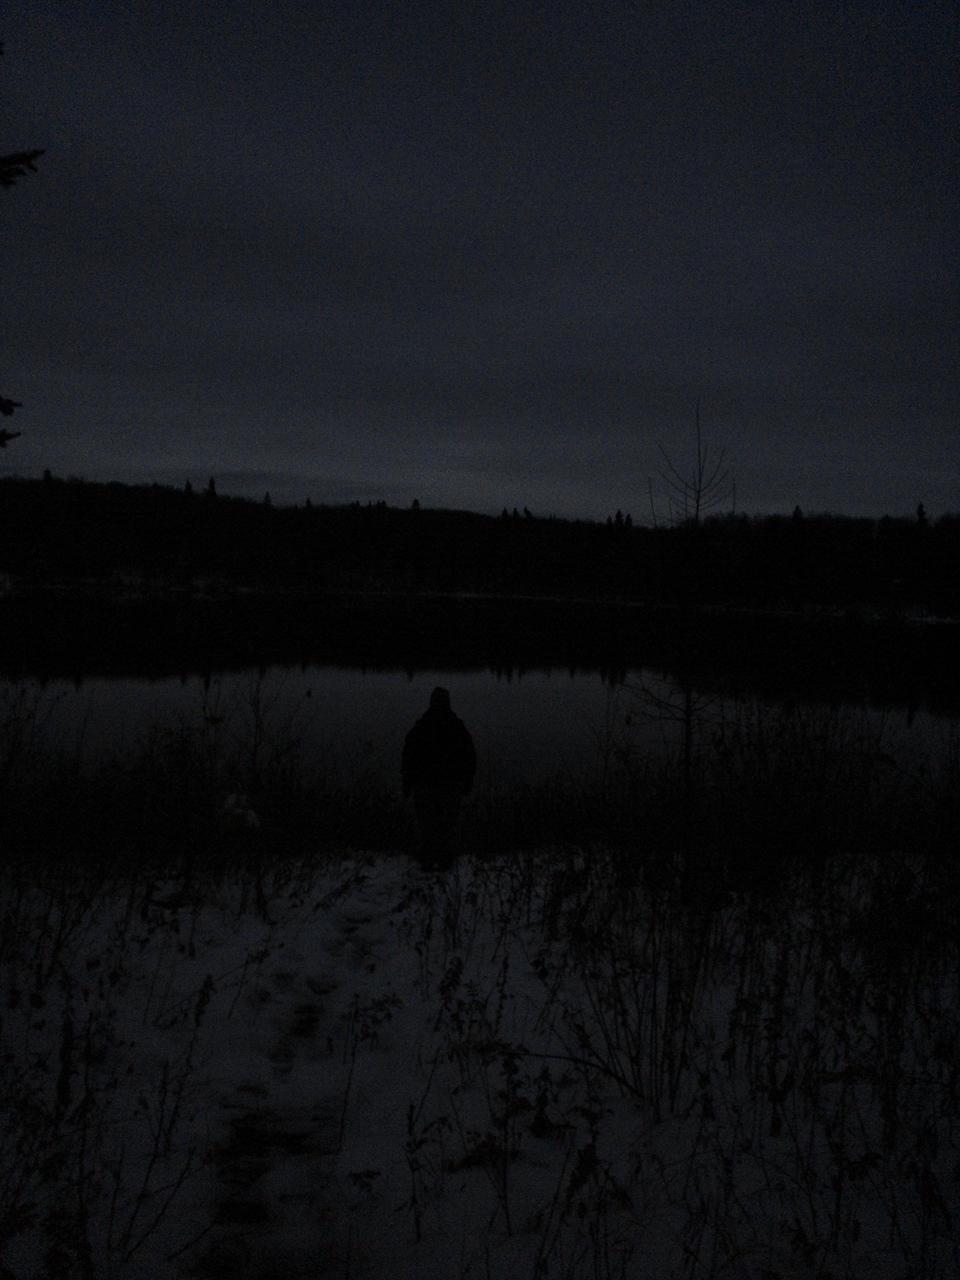 Carrie on Moose Lake by Firedraik